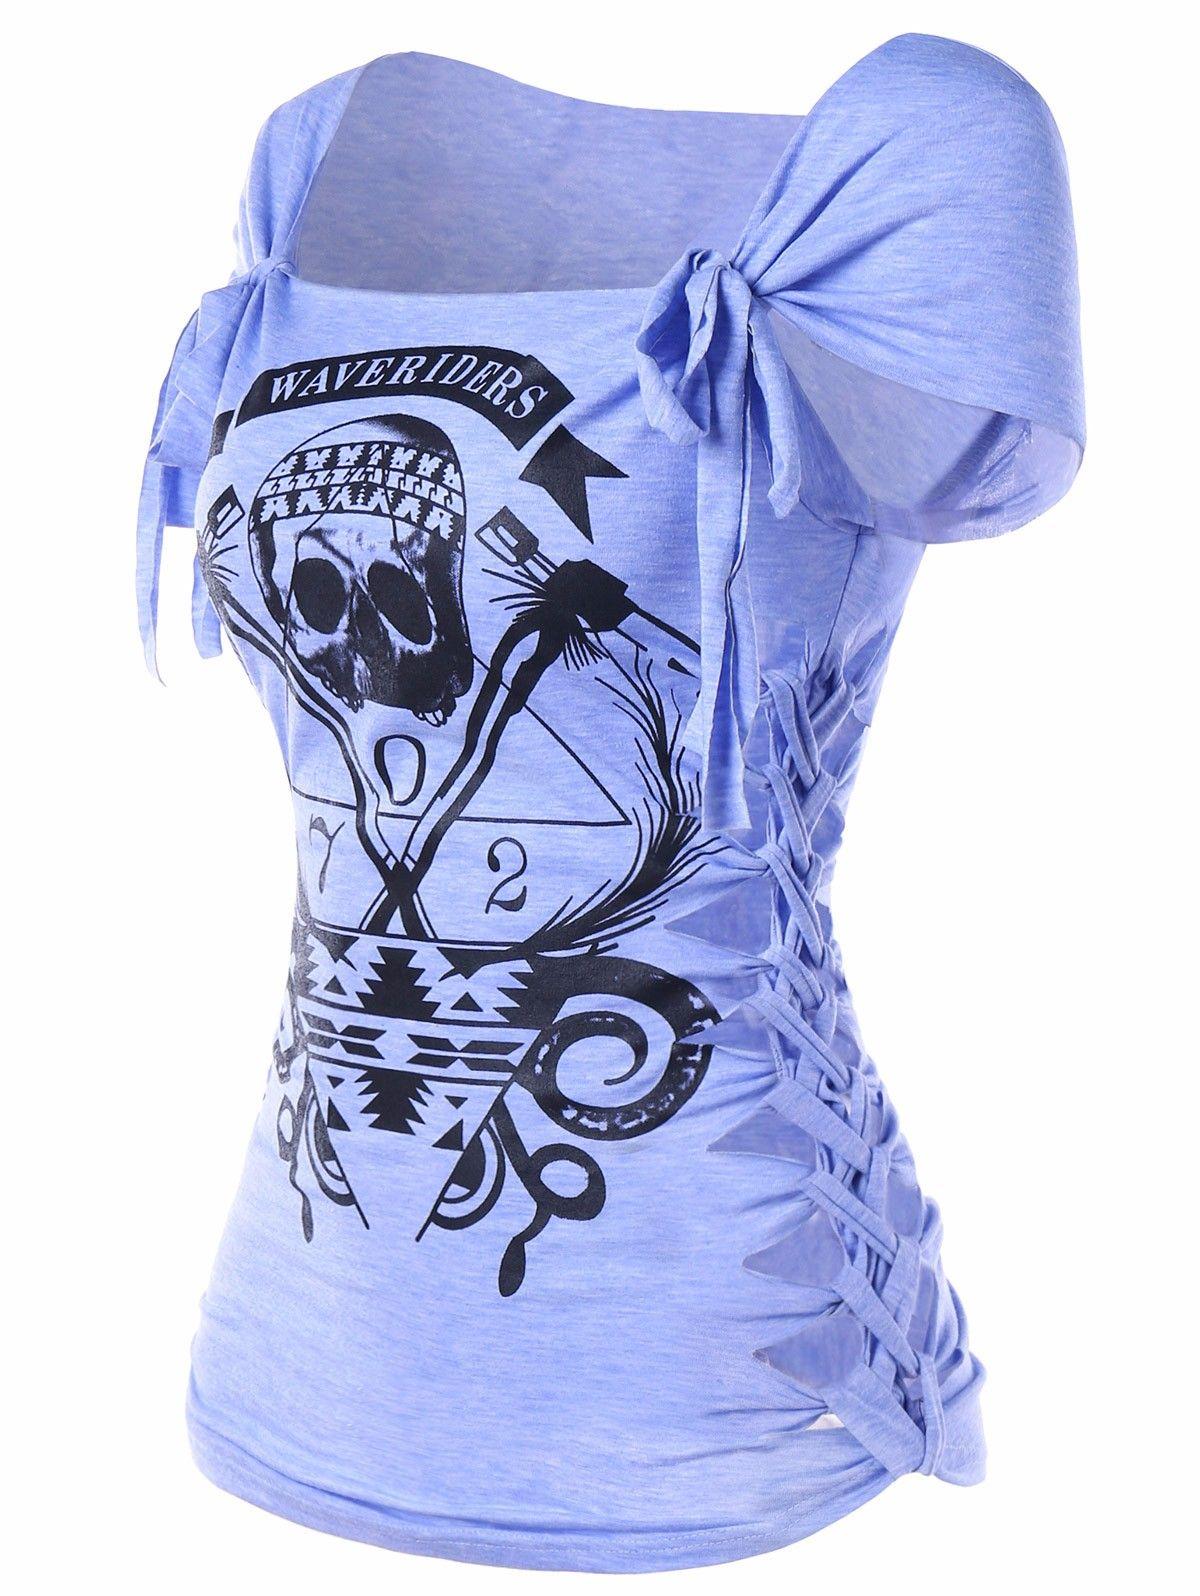 5b2486a2a5fe Gamiss Skull Print Braided Shredding T Shirt Women Summer Casual Square  Neck Short Sleeve Graphic Tee Women T Shirt Big Size 2XL Retro Tees Weird T  Shirts ...